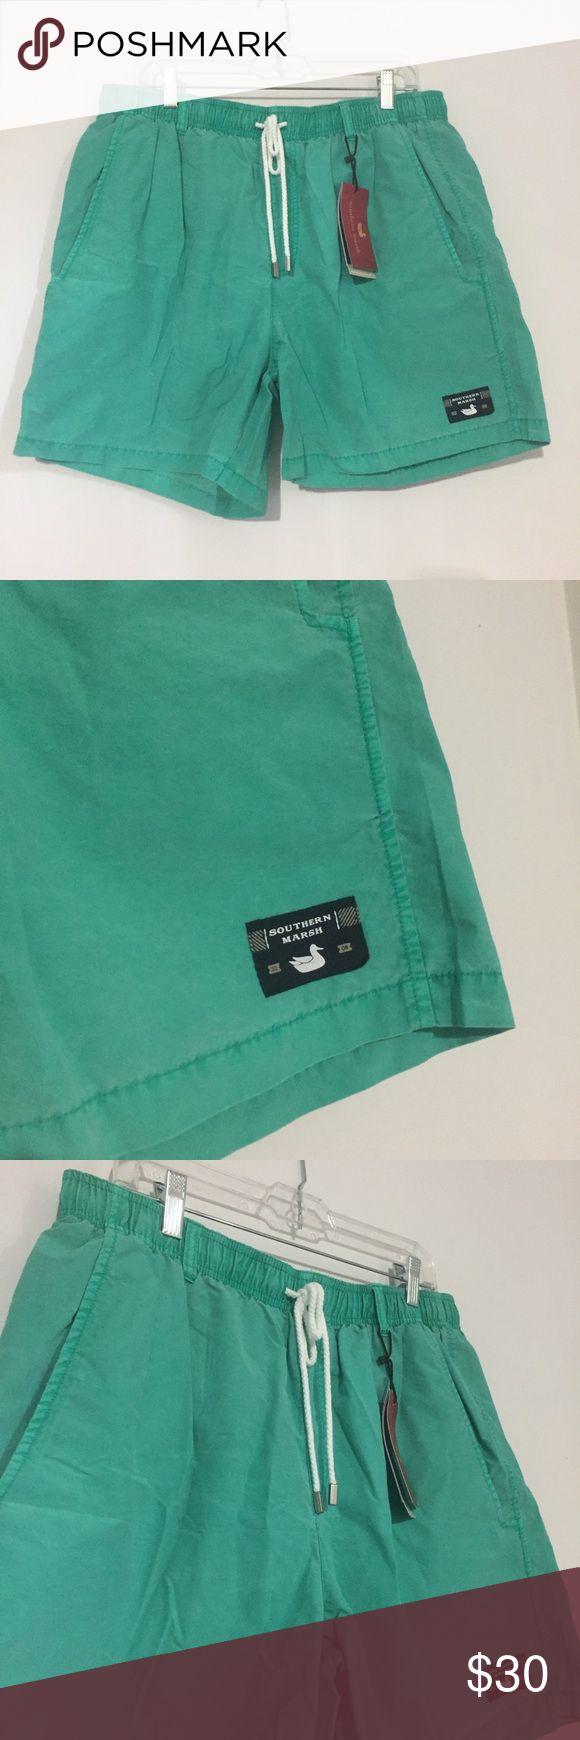 Southern Marsh Bathing Suit Great green color! Men's bathing suit by Southern Marsh, NWT!! Southern Marsh Swim Swim Trunks